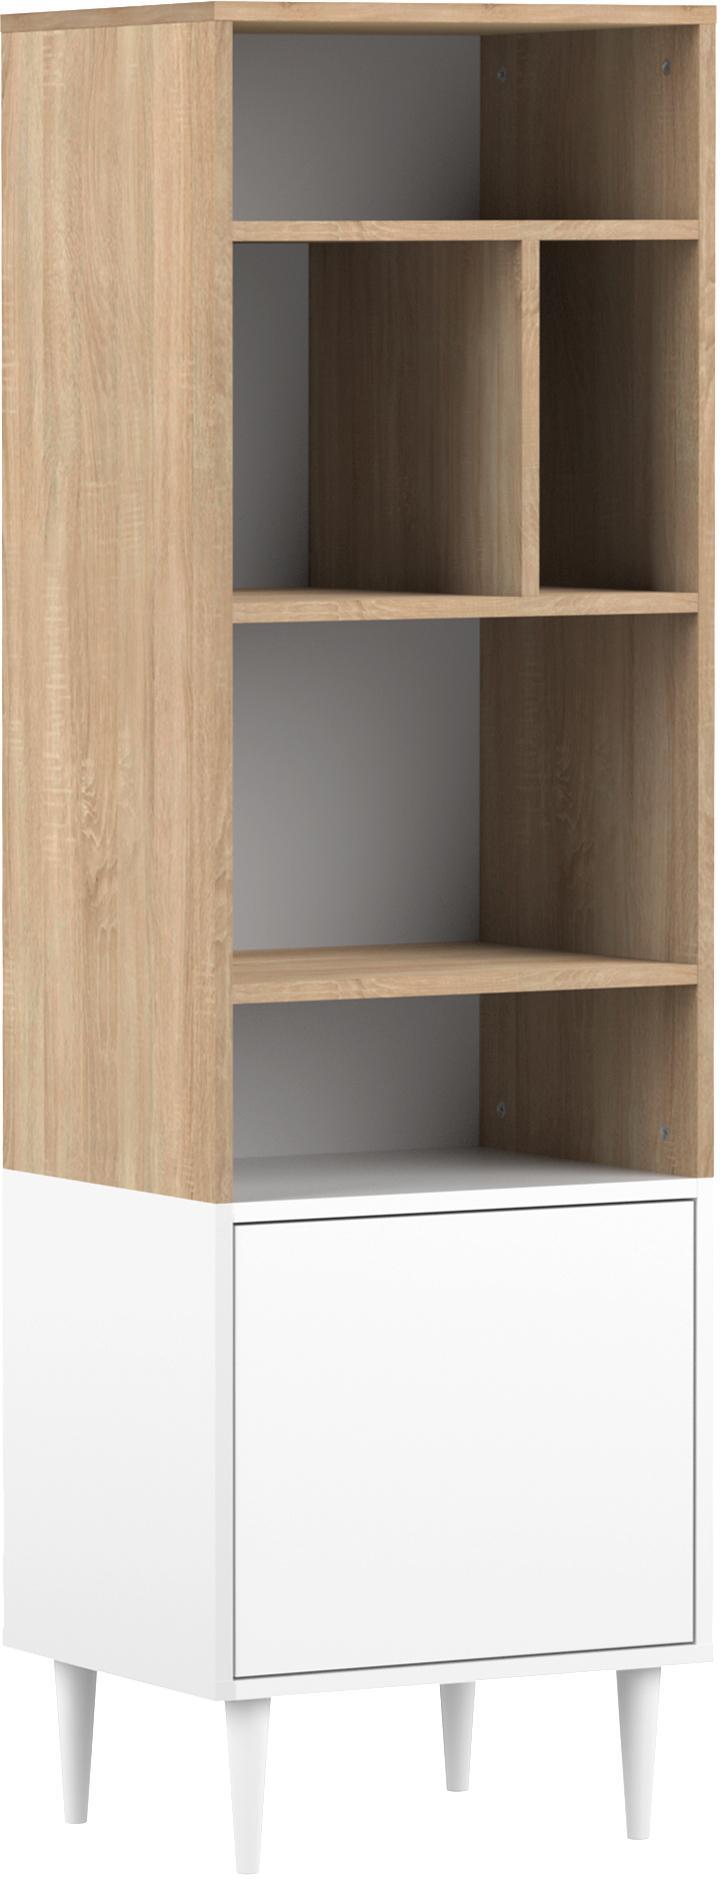 Schmales Standregal Horizon im Skandi Design, Korpus: Spanplatte, melaminbeschi, Füße: Buchenholz, massiv, lacki, Eichenholz, Weiß, 47 x 153 cm